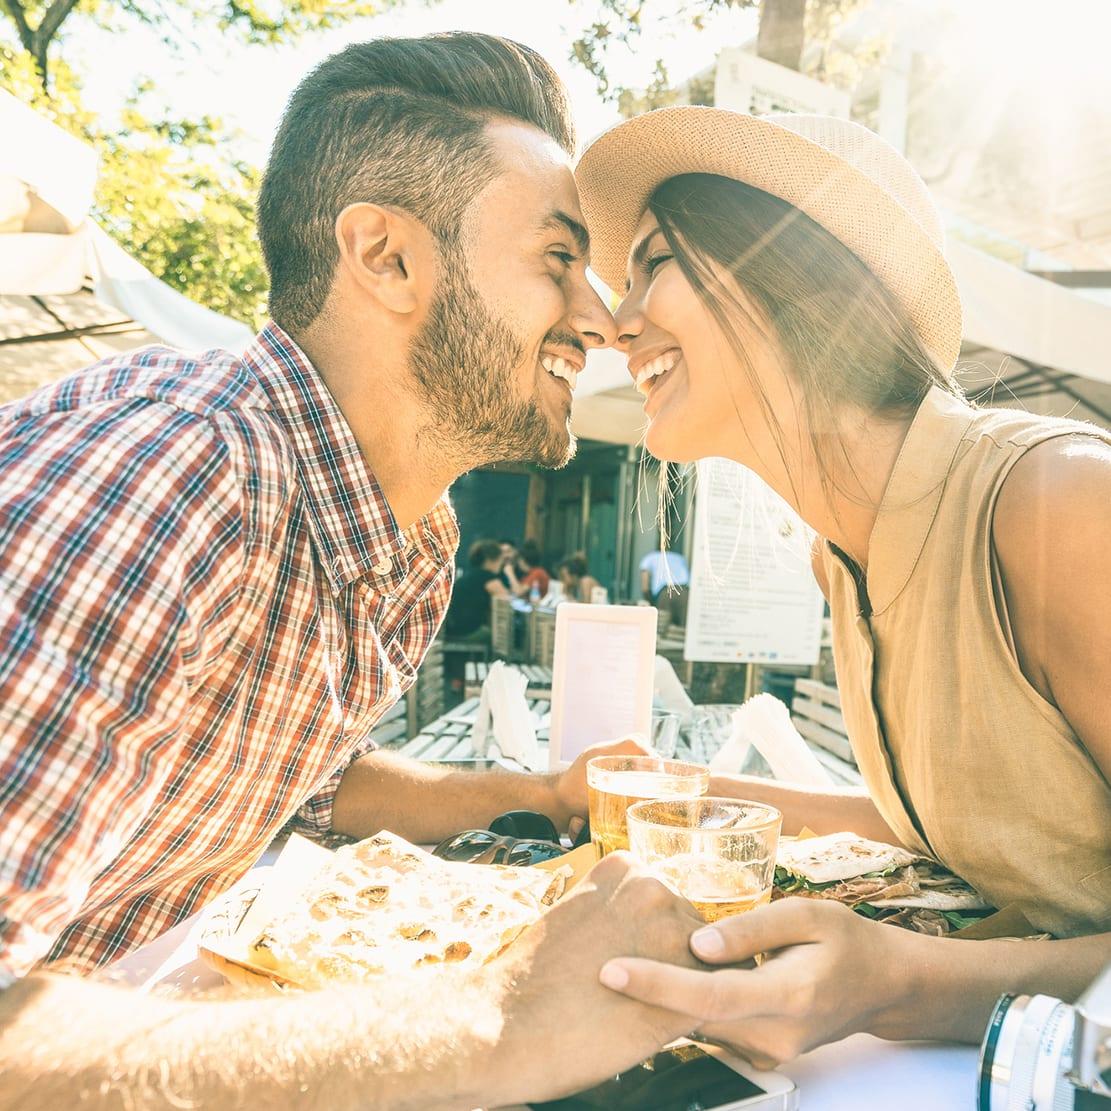 How to Share Finances as a Couple